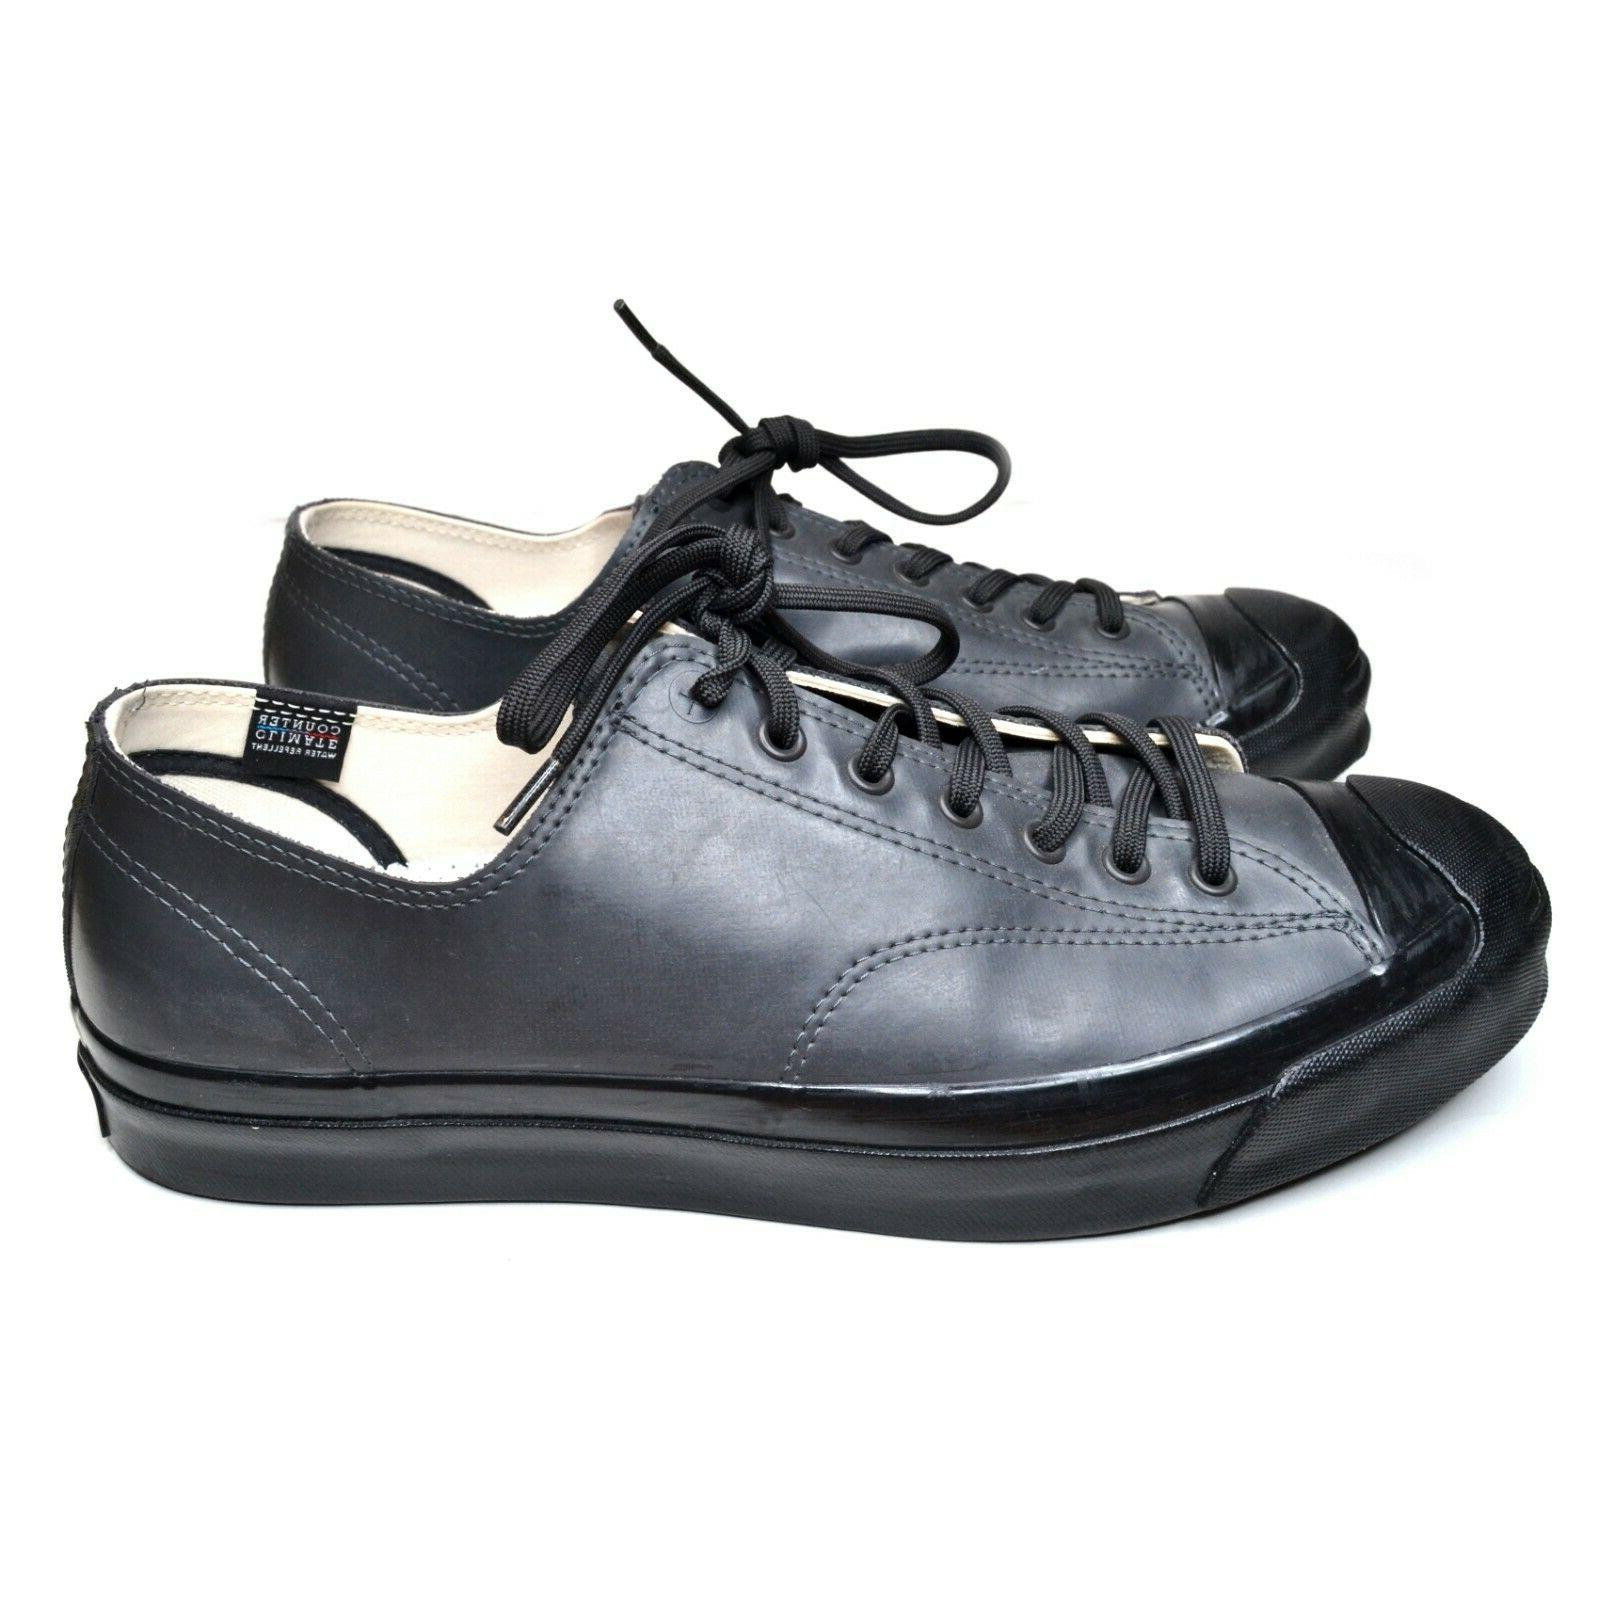 Jack Water Repellent Shoes 153584C Mens 11 Womens